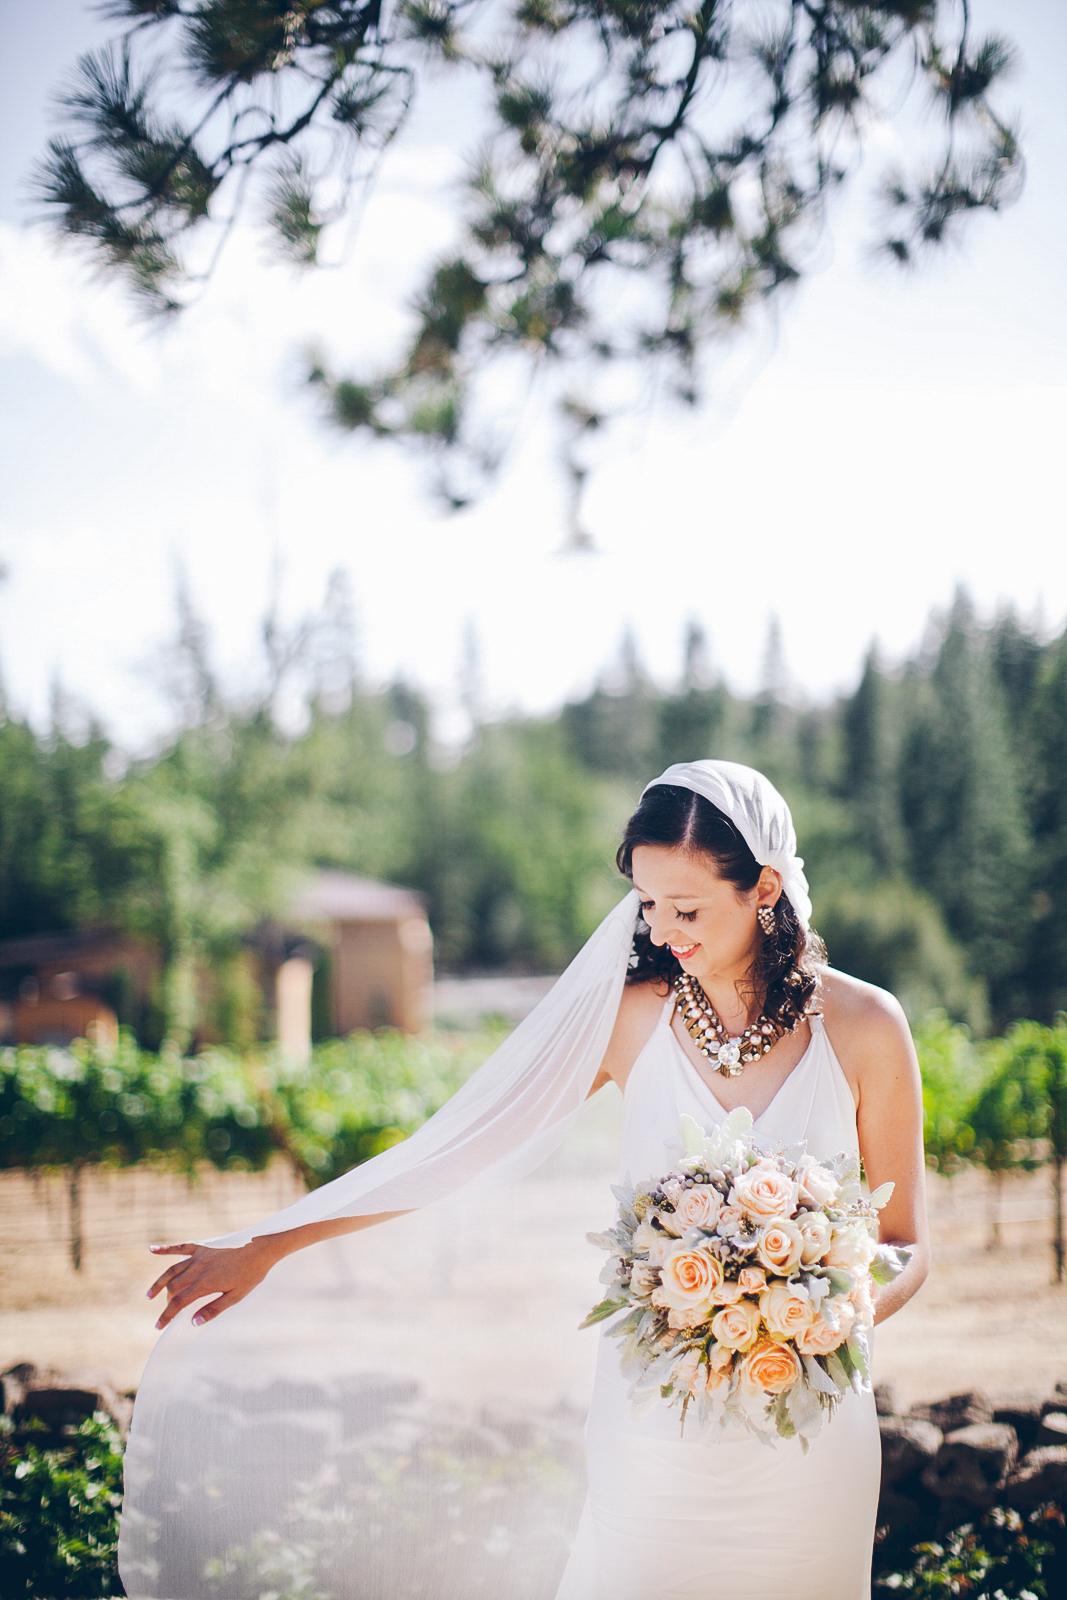 miraflores_winery_wedding_photography_ian_melissa_ebony_siovhan_bokeh_photography_10.jpg